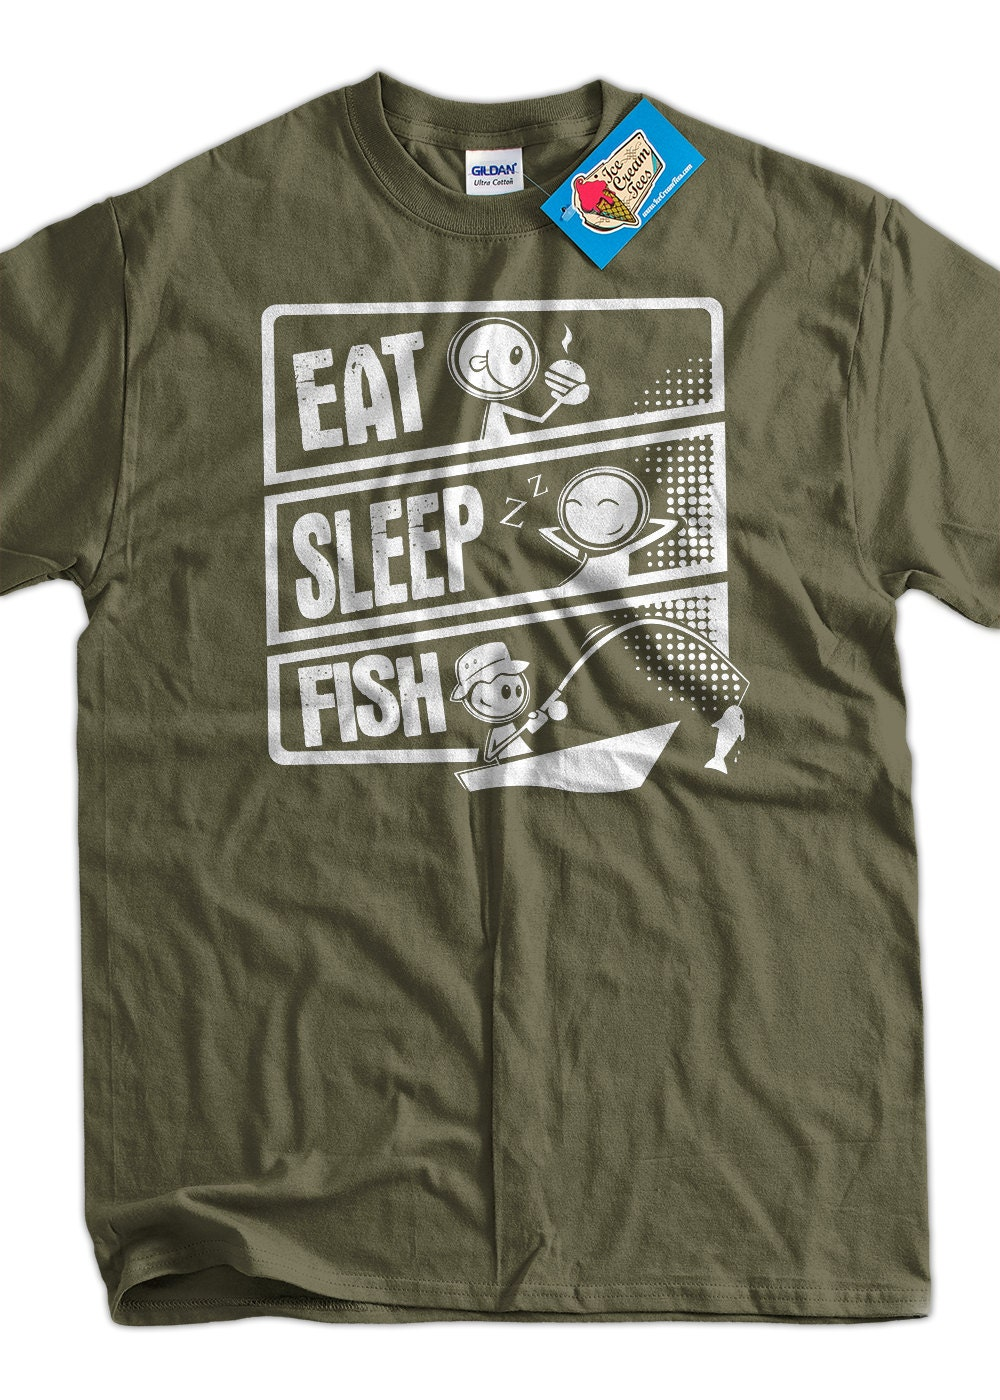 Items Similar To Fishing T Shirt Fish T Shirt Eat Sleep